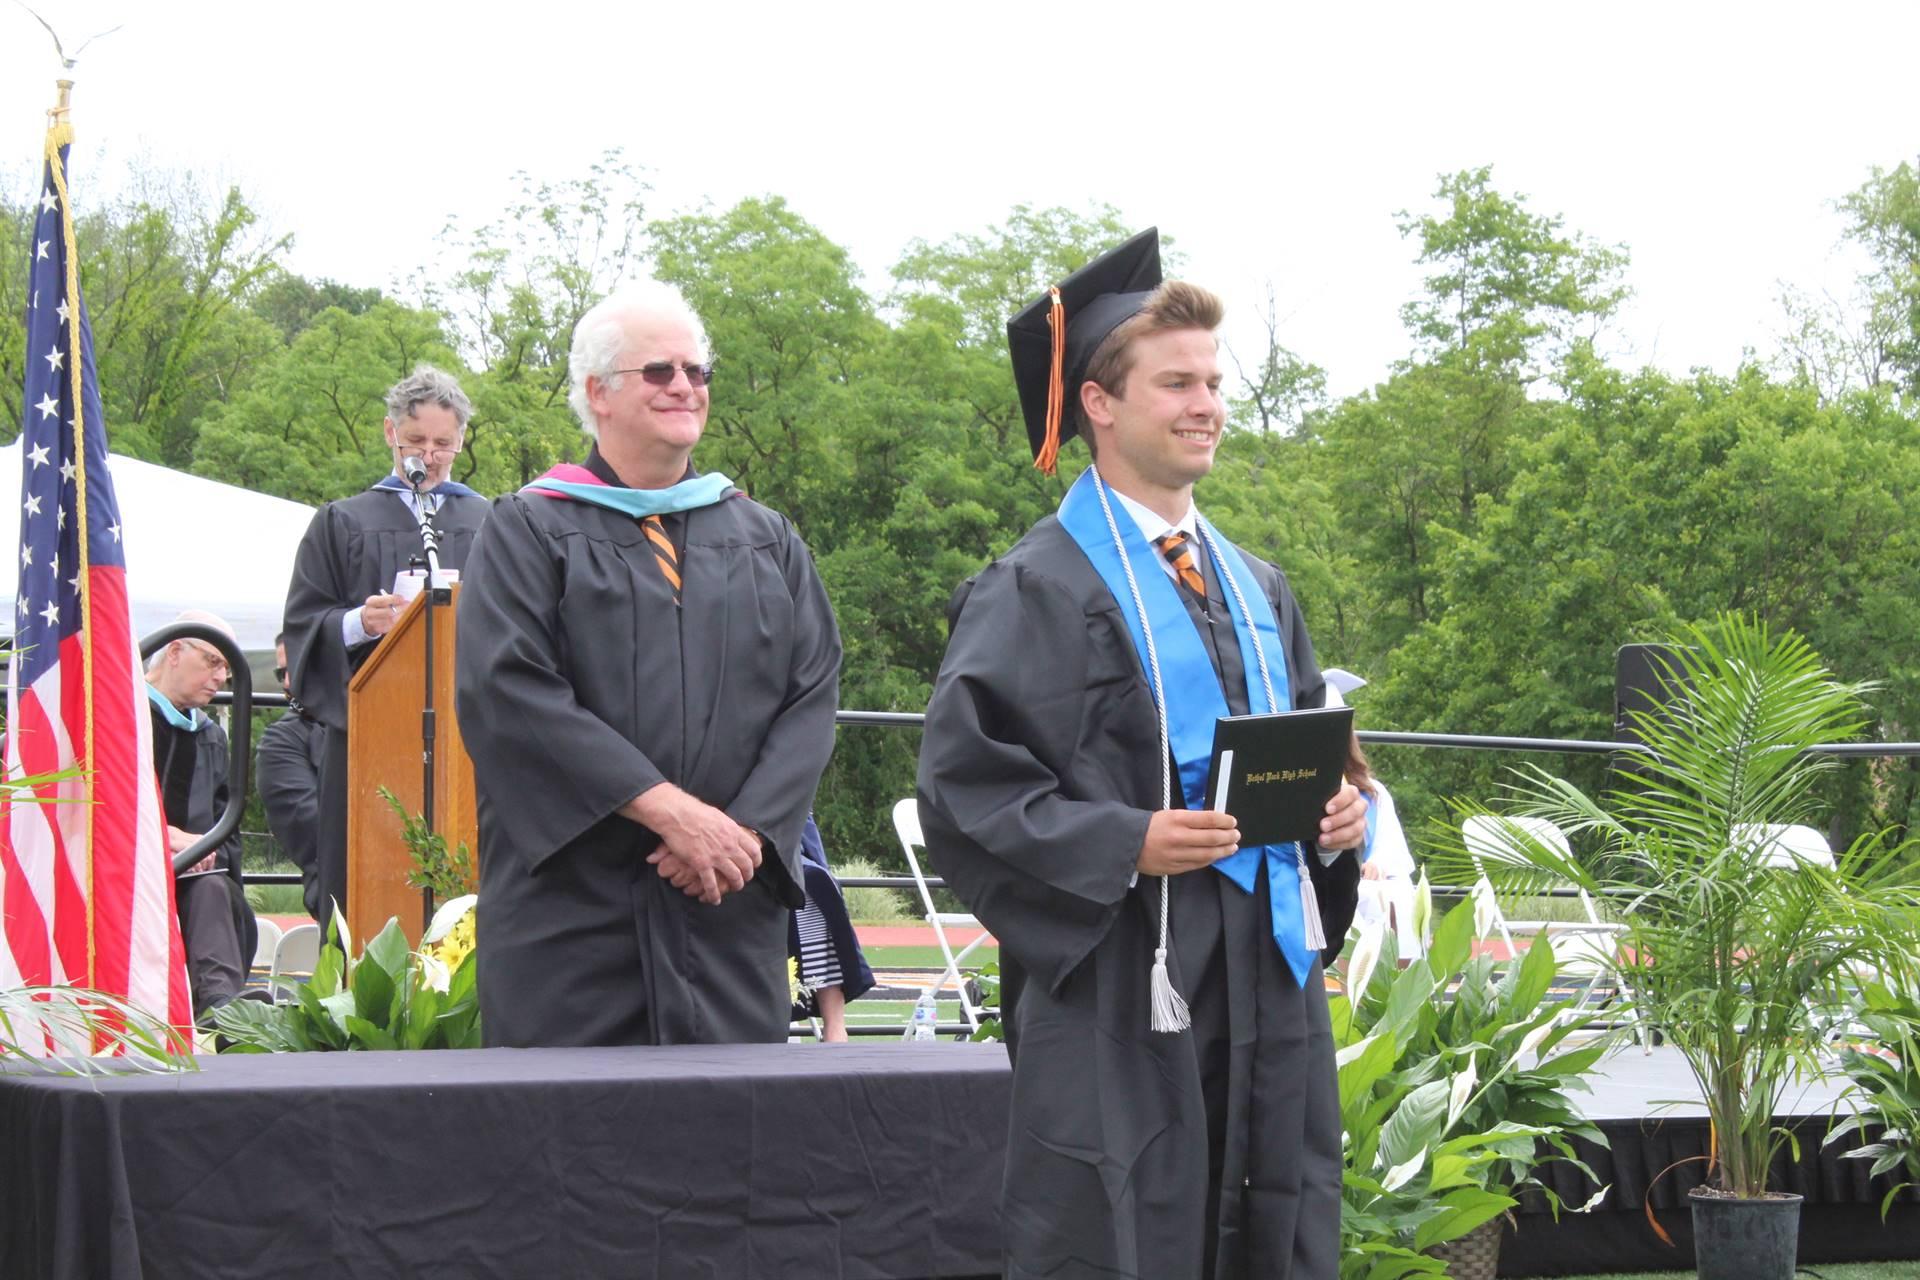 graduate with diploma